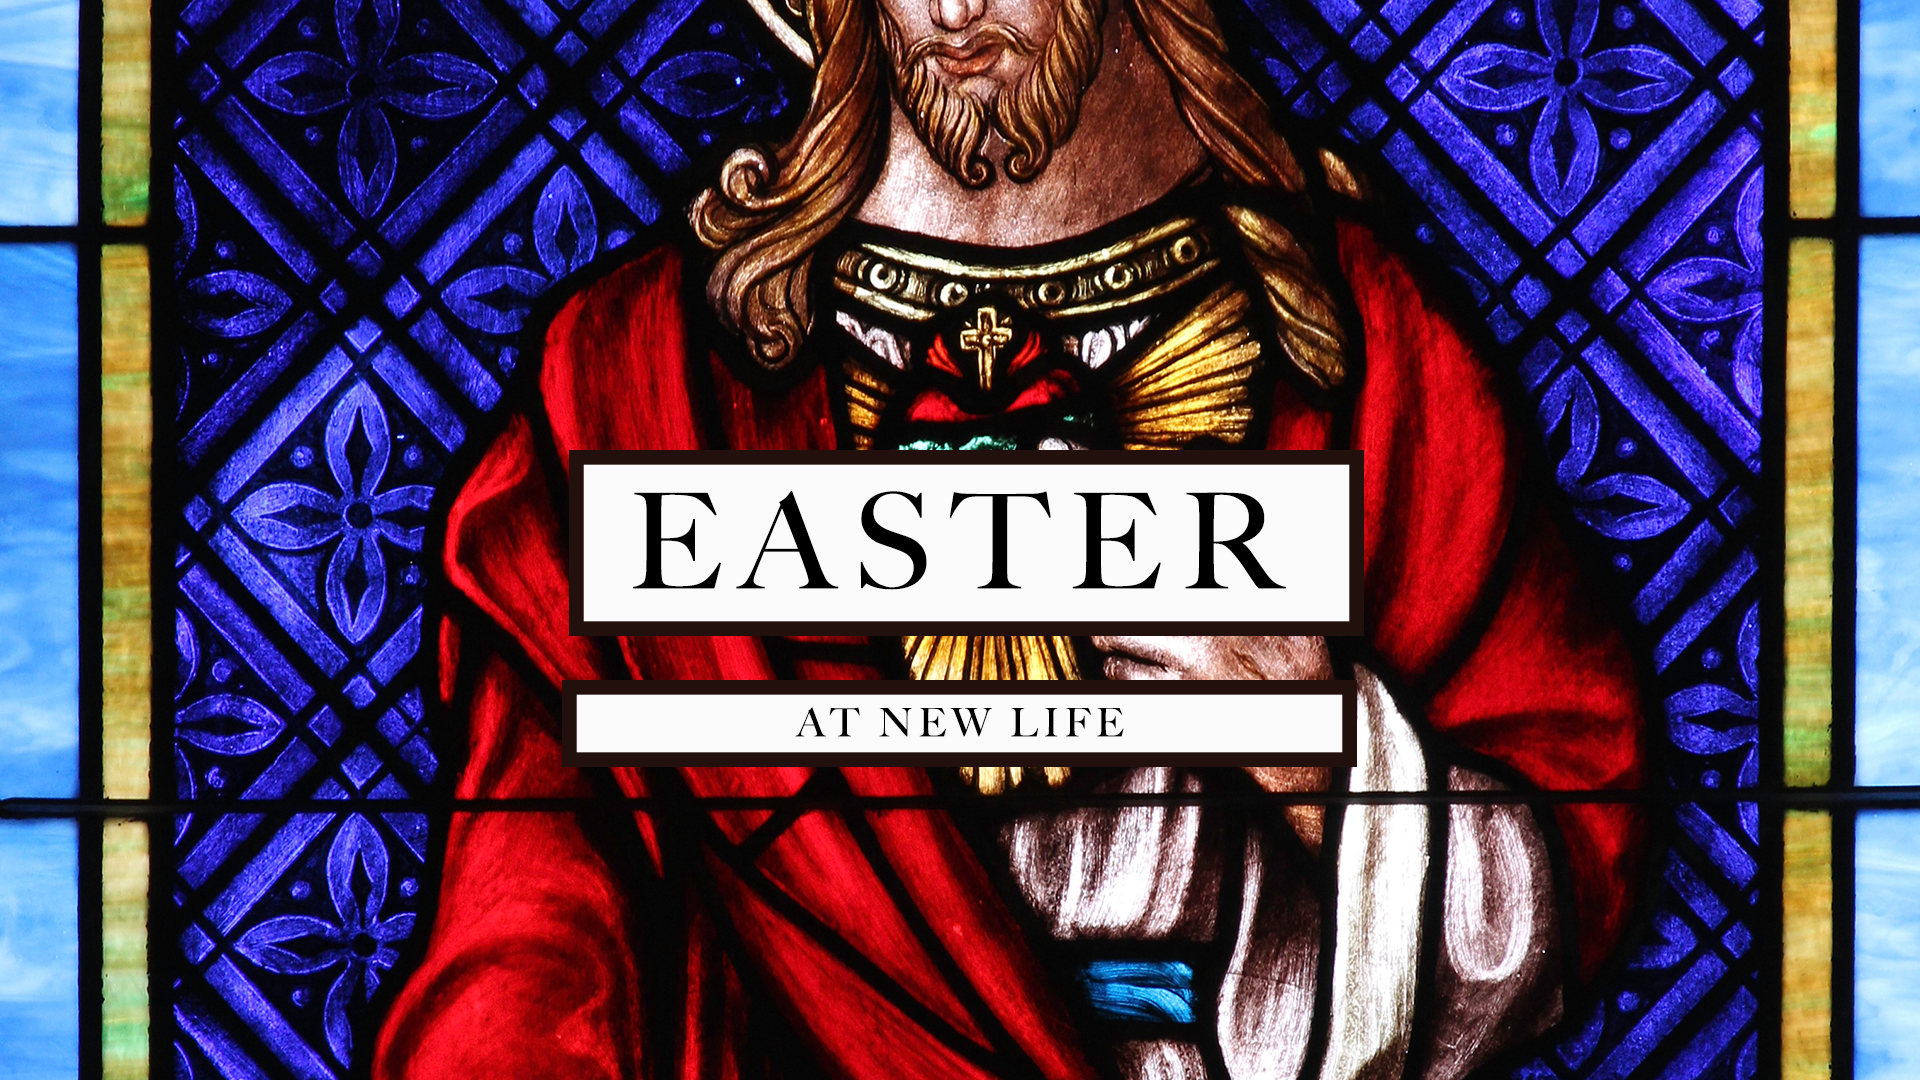 EasterSatinedGlass.jpg